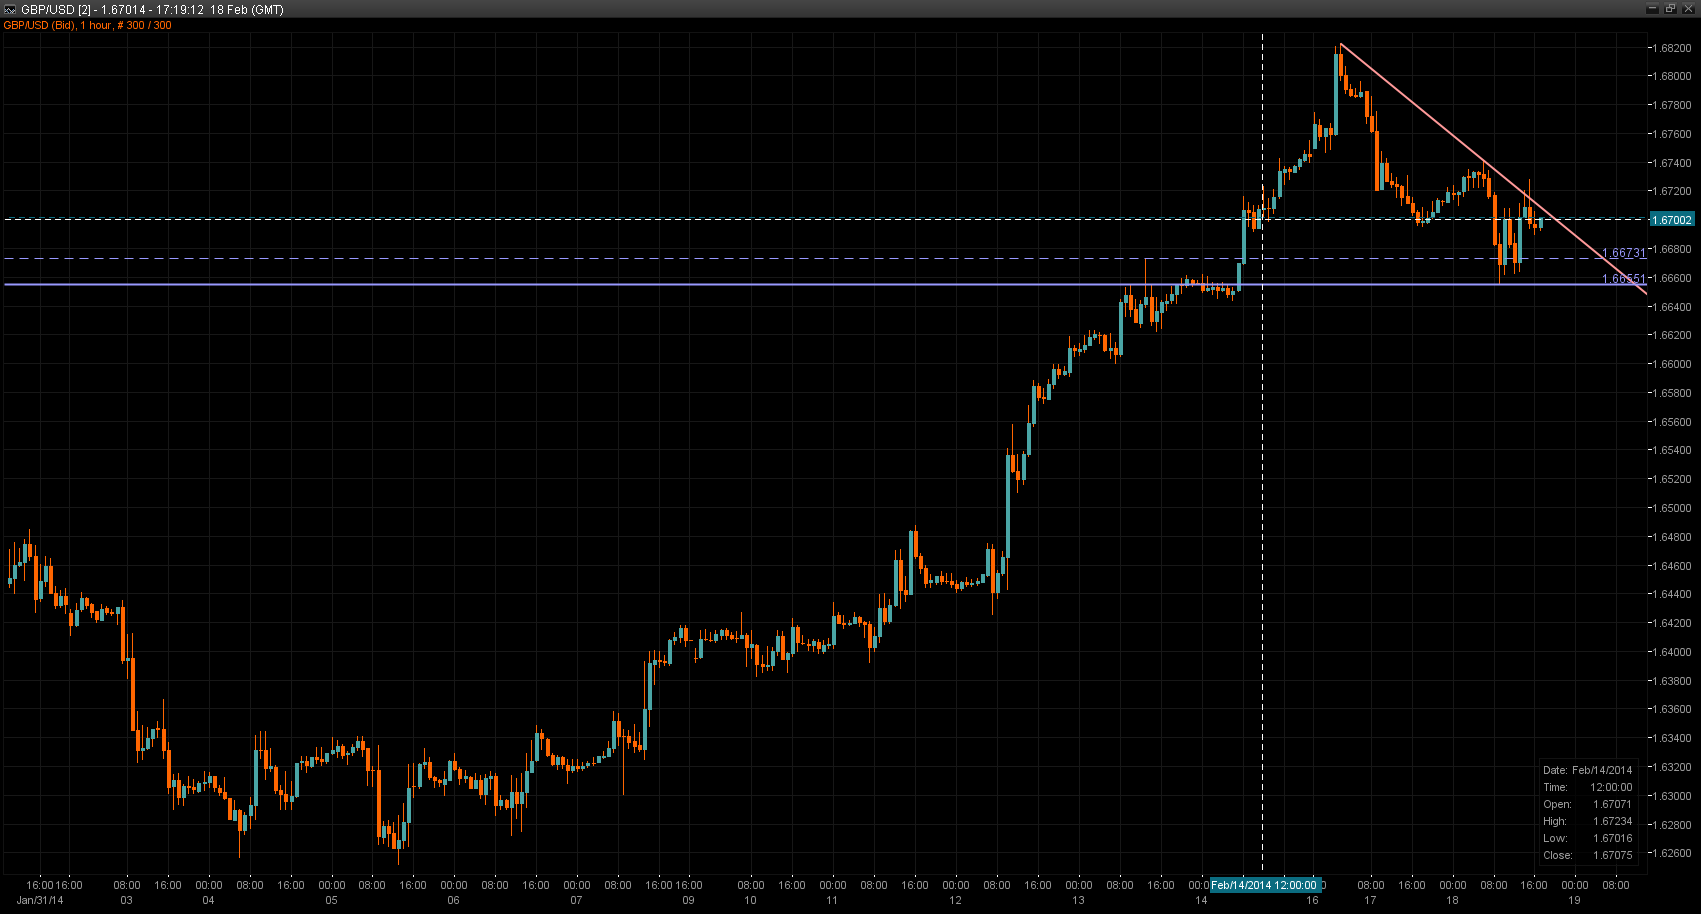 GBP/USD Chart 18 Feb 2014